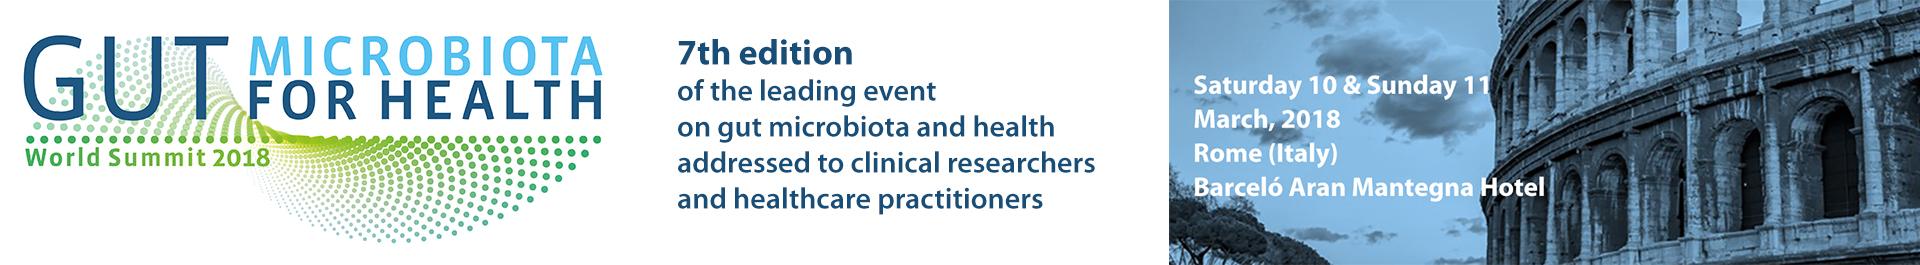 Gut Microbiota for Health World Summit 2018